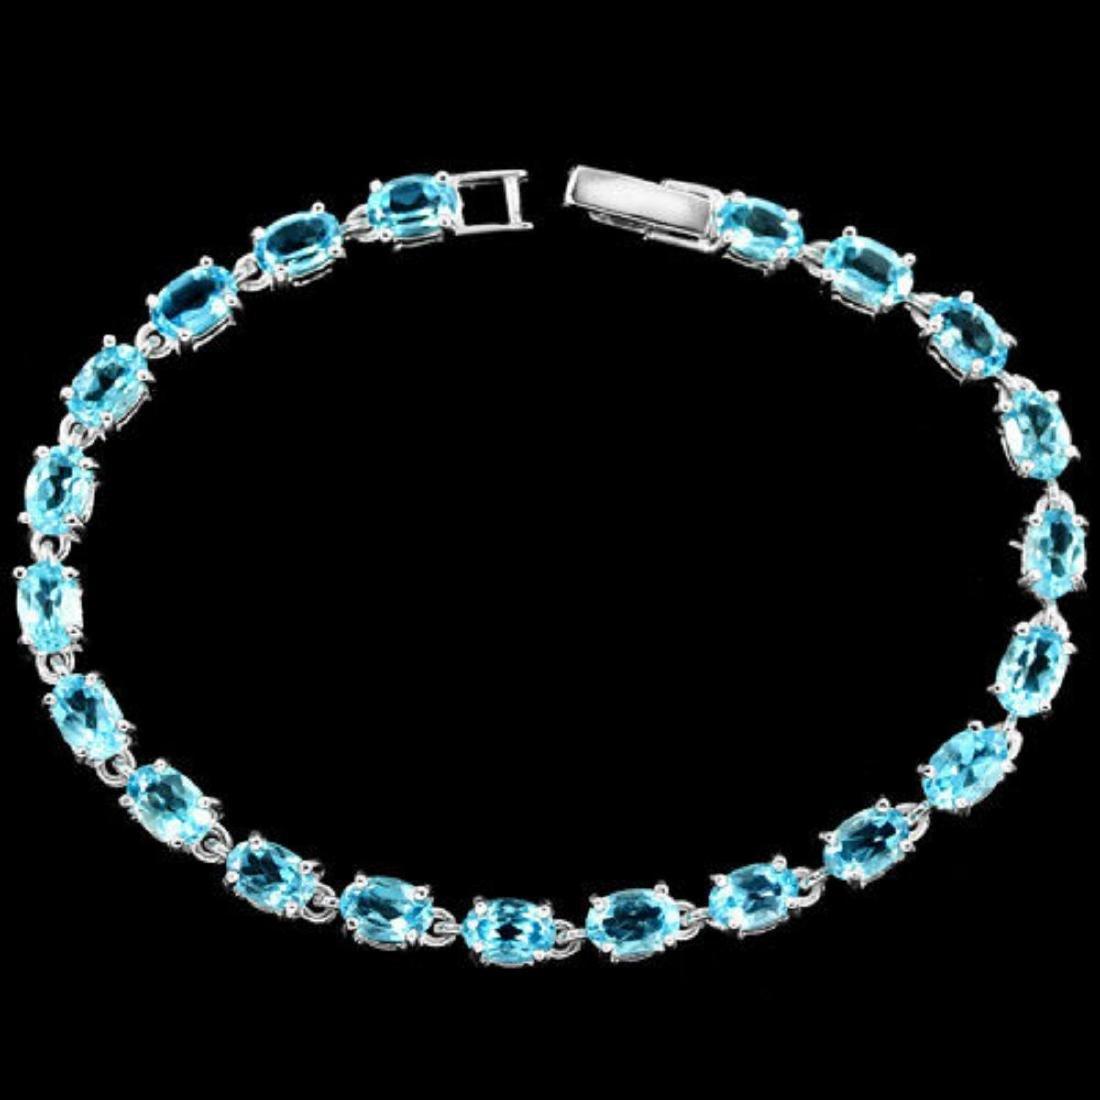 Natural SWISS BLUE TOPAZ Bracelet